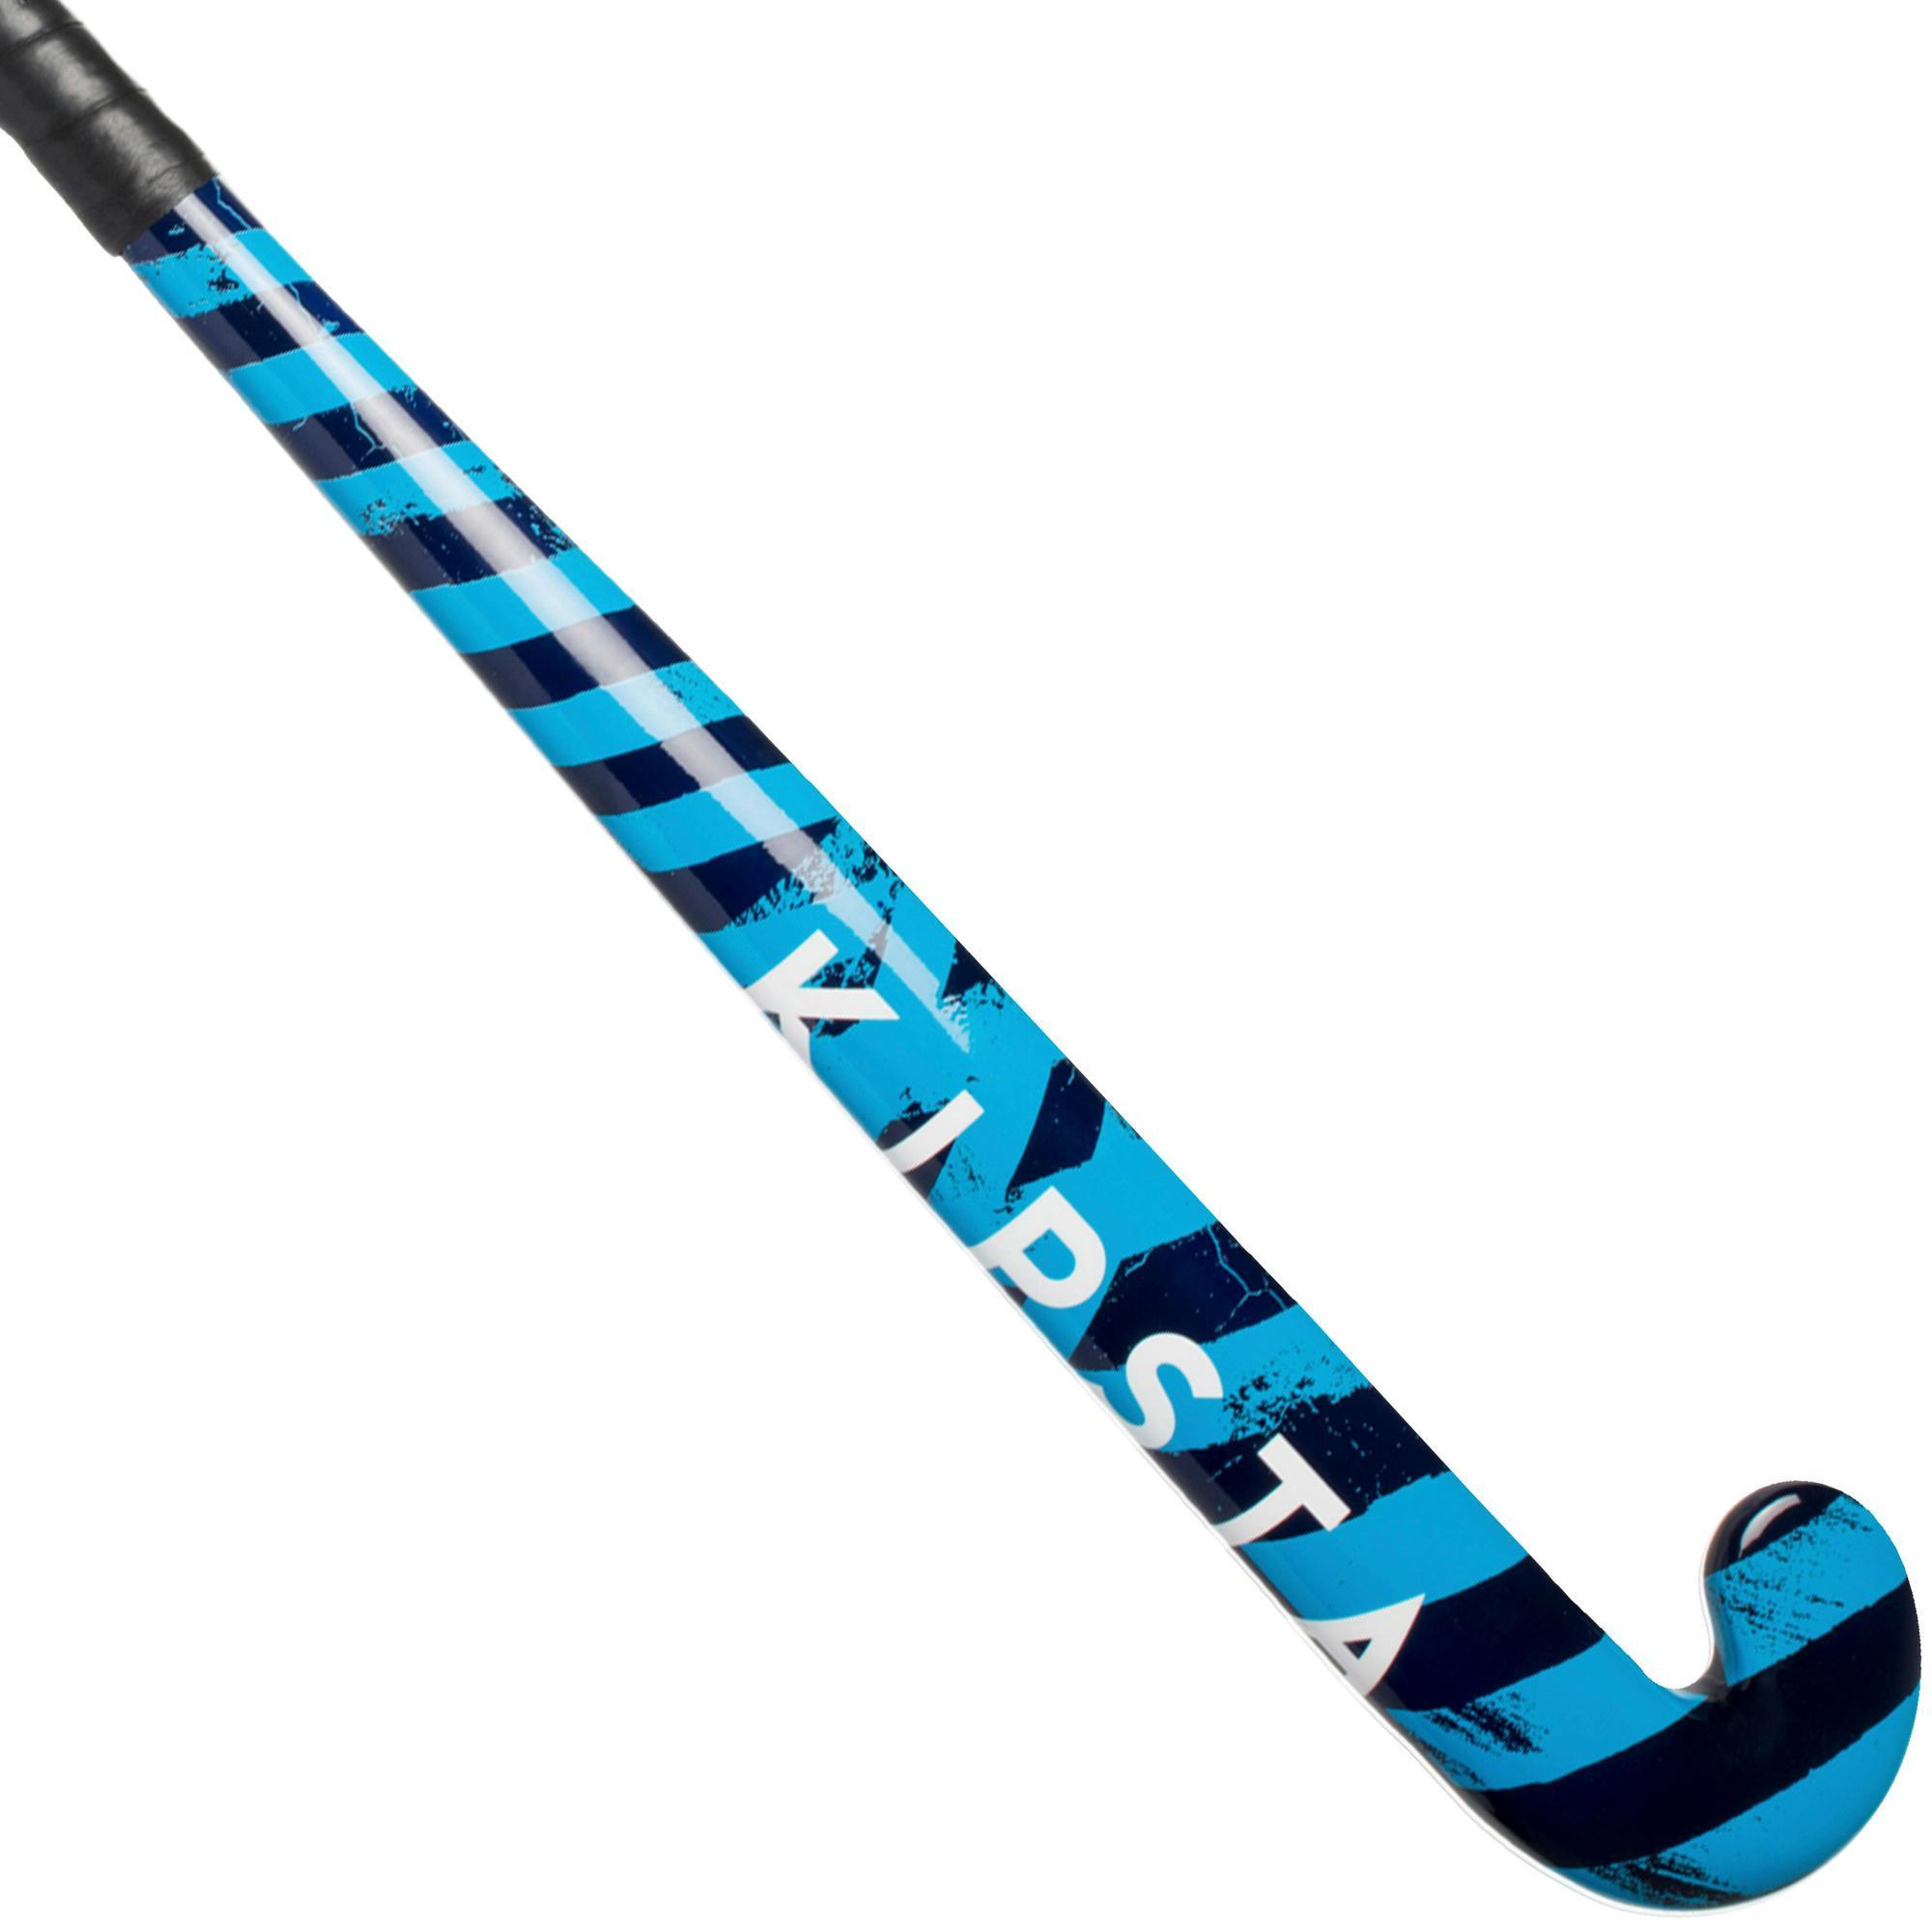 Kipsta Hockeystick beginnende kind/volw recreatief FH100 hout/glasvezel geel blauw